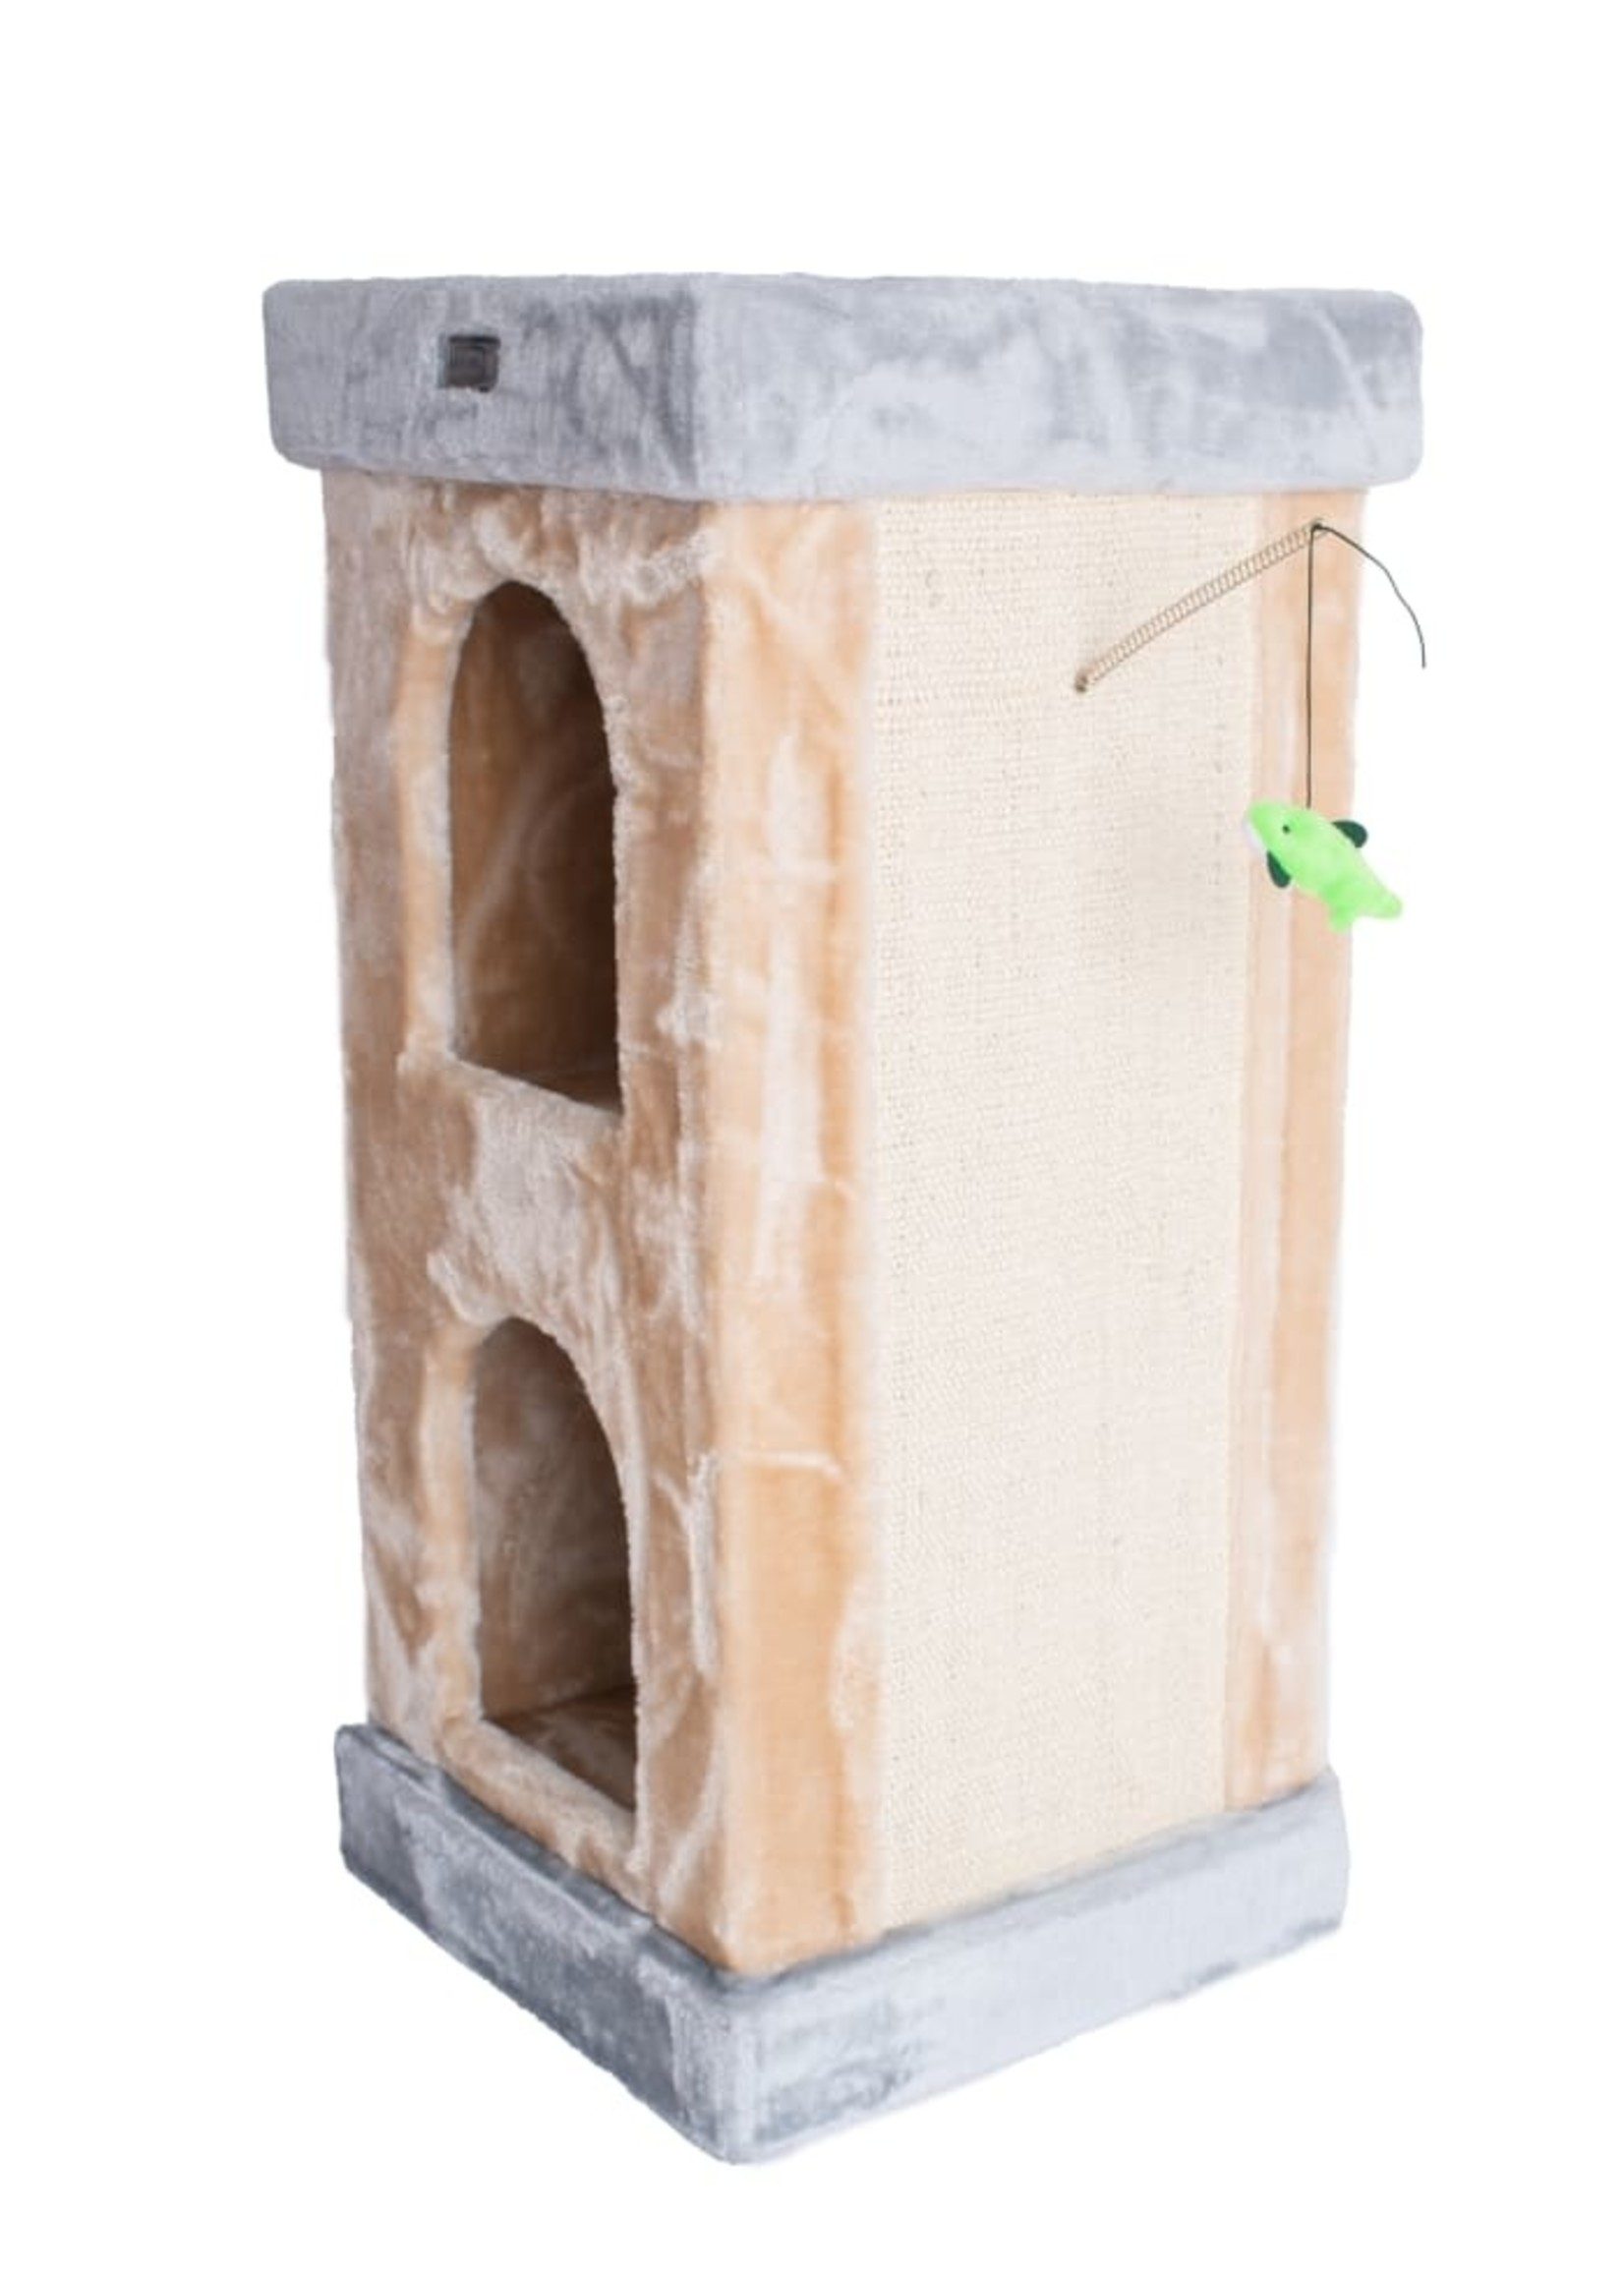 Armarkat Armarkat Double Condo Cat House w/Scratching Carpet